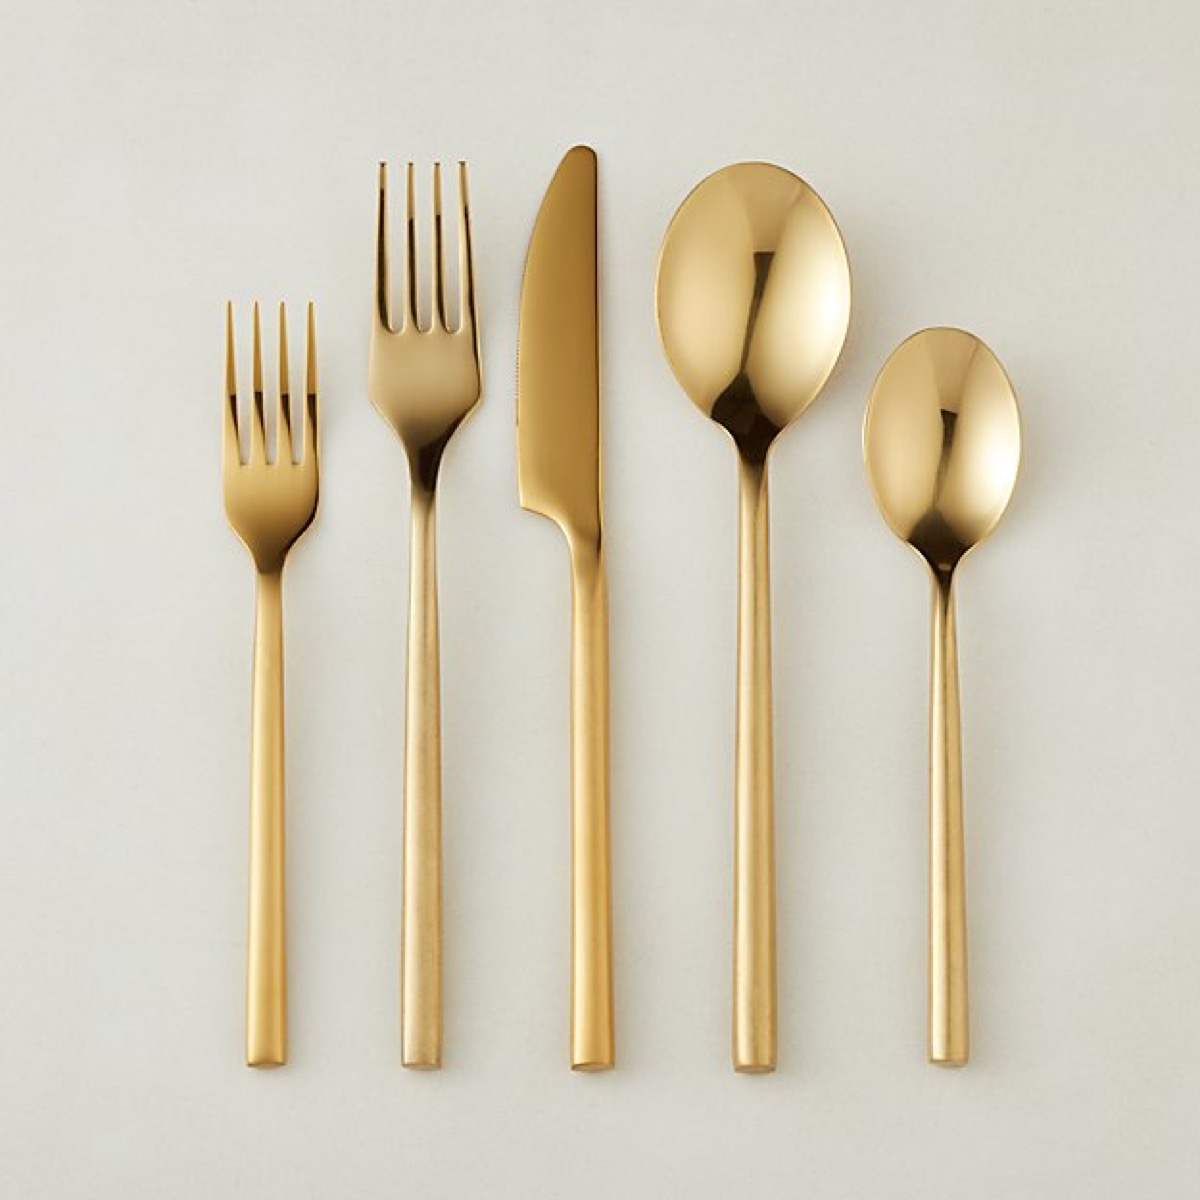 20 piece rush gold flatware